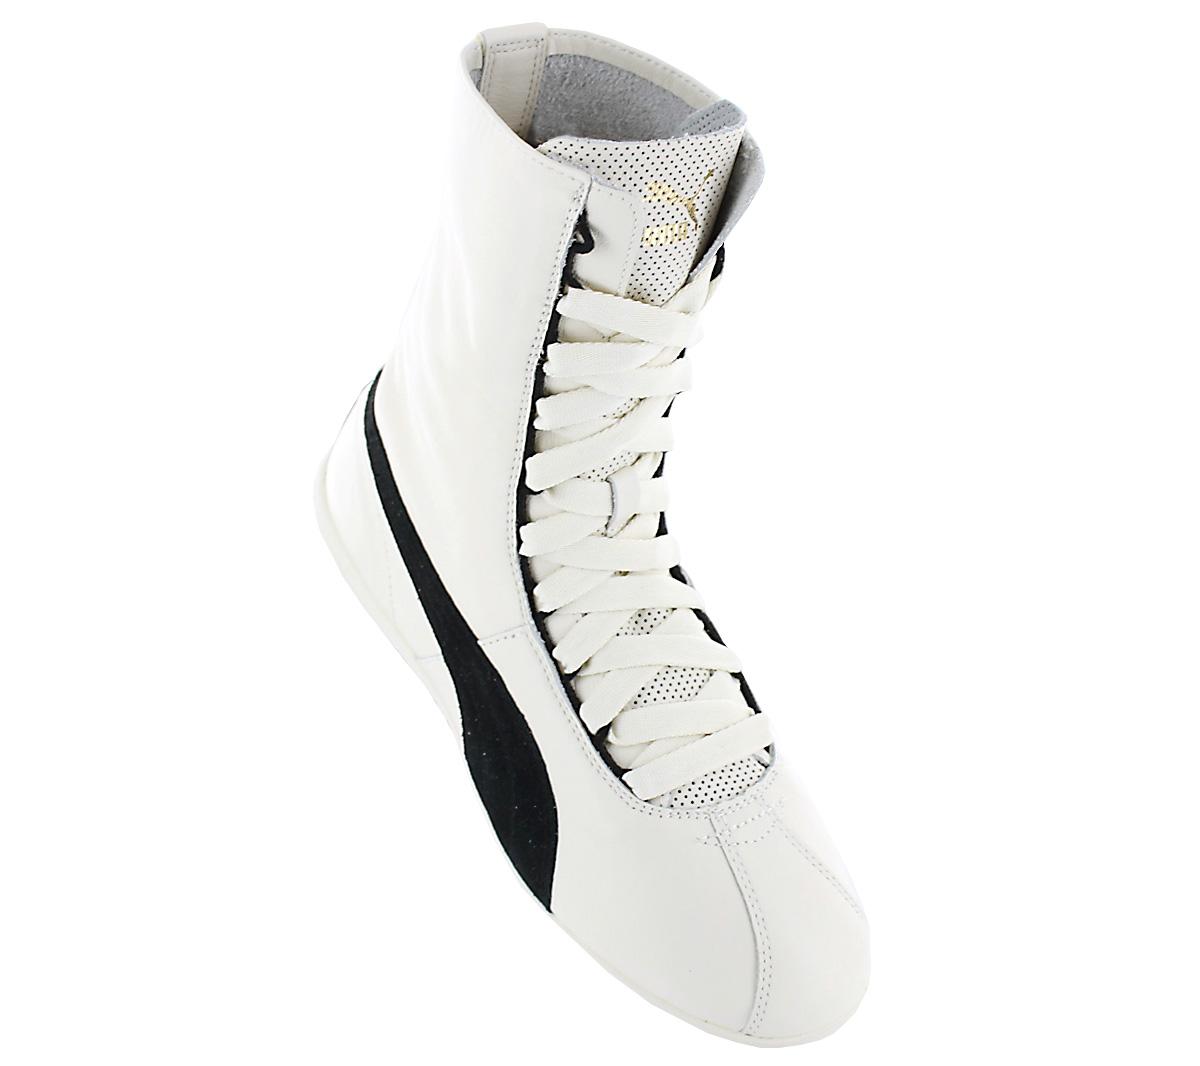 9cf820aa3df9 Puma Eskiva Hi Women s Sneakers Boots Boots Leather White Boxer ...